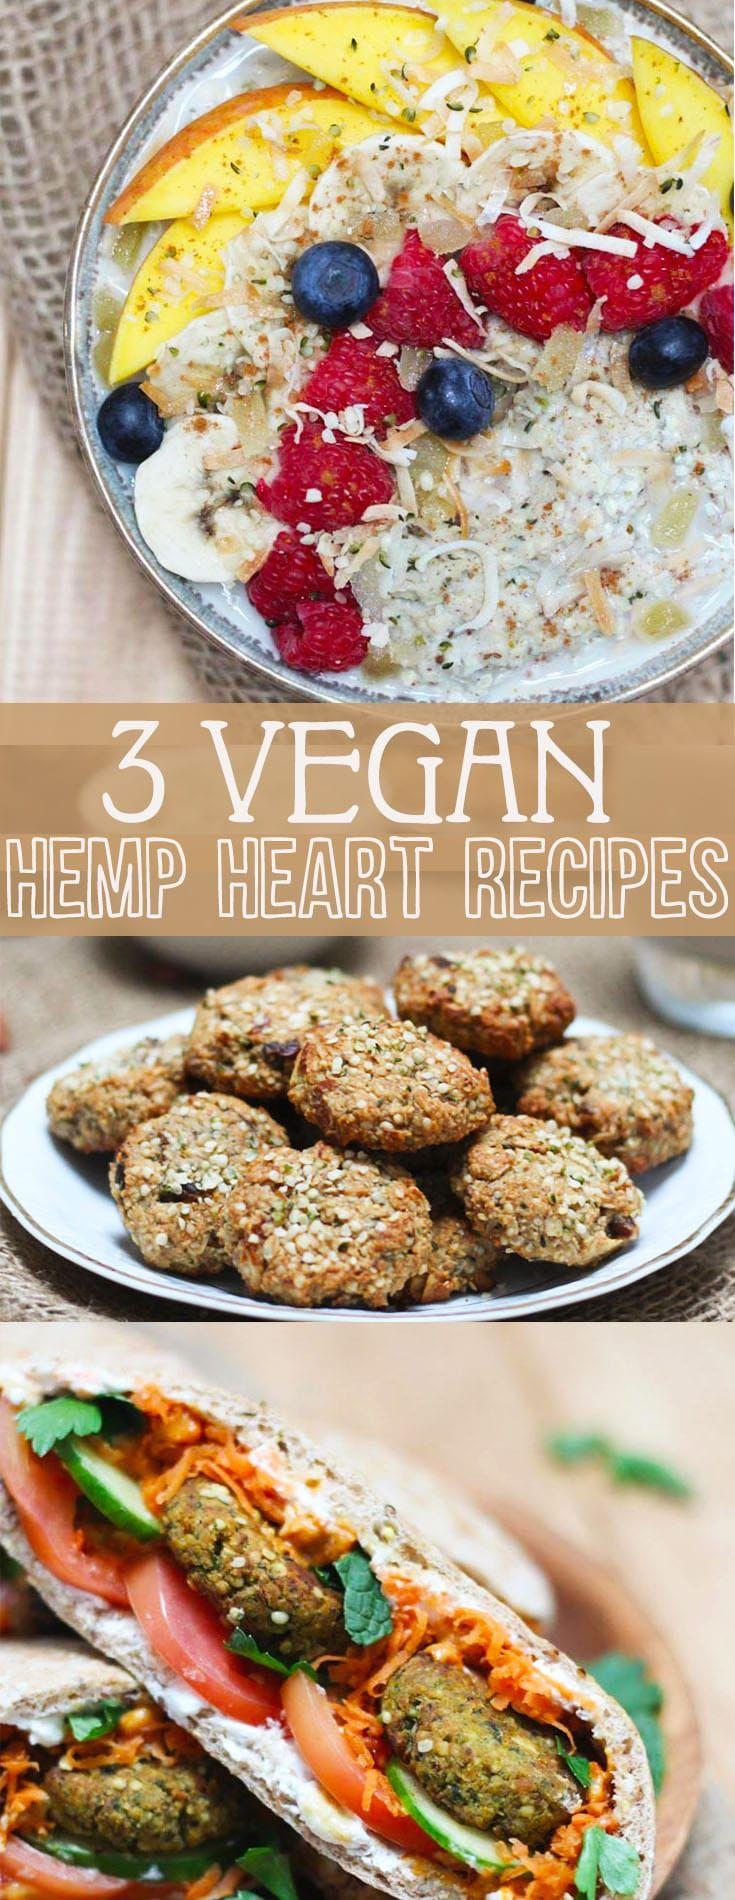 I share my three favourite vegan hemp hearts recipes including a healthy falafel, power cookies, and hemp hearts no-oats porridge!